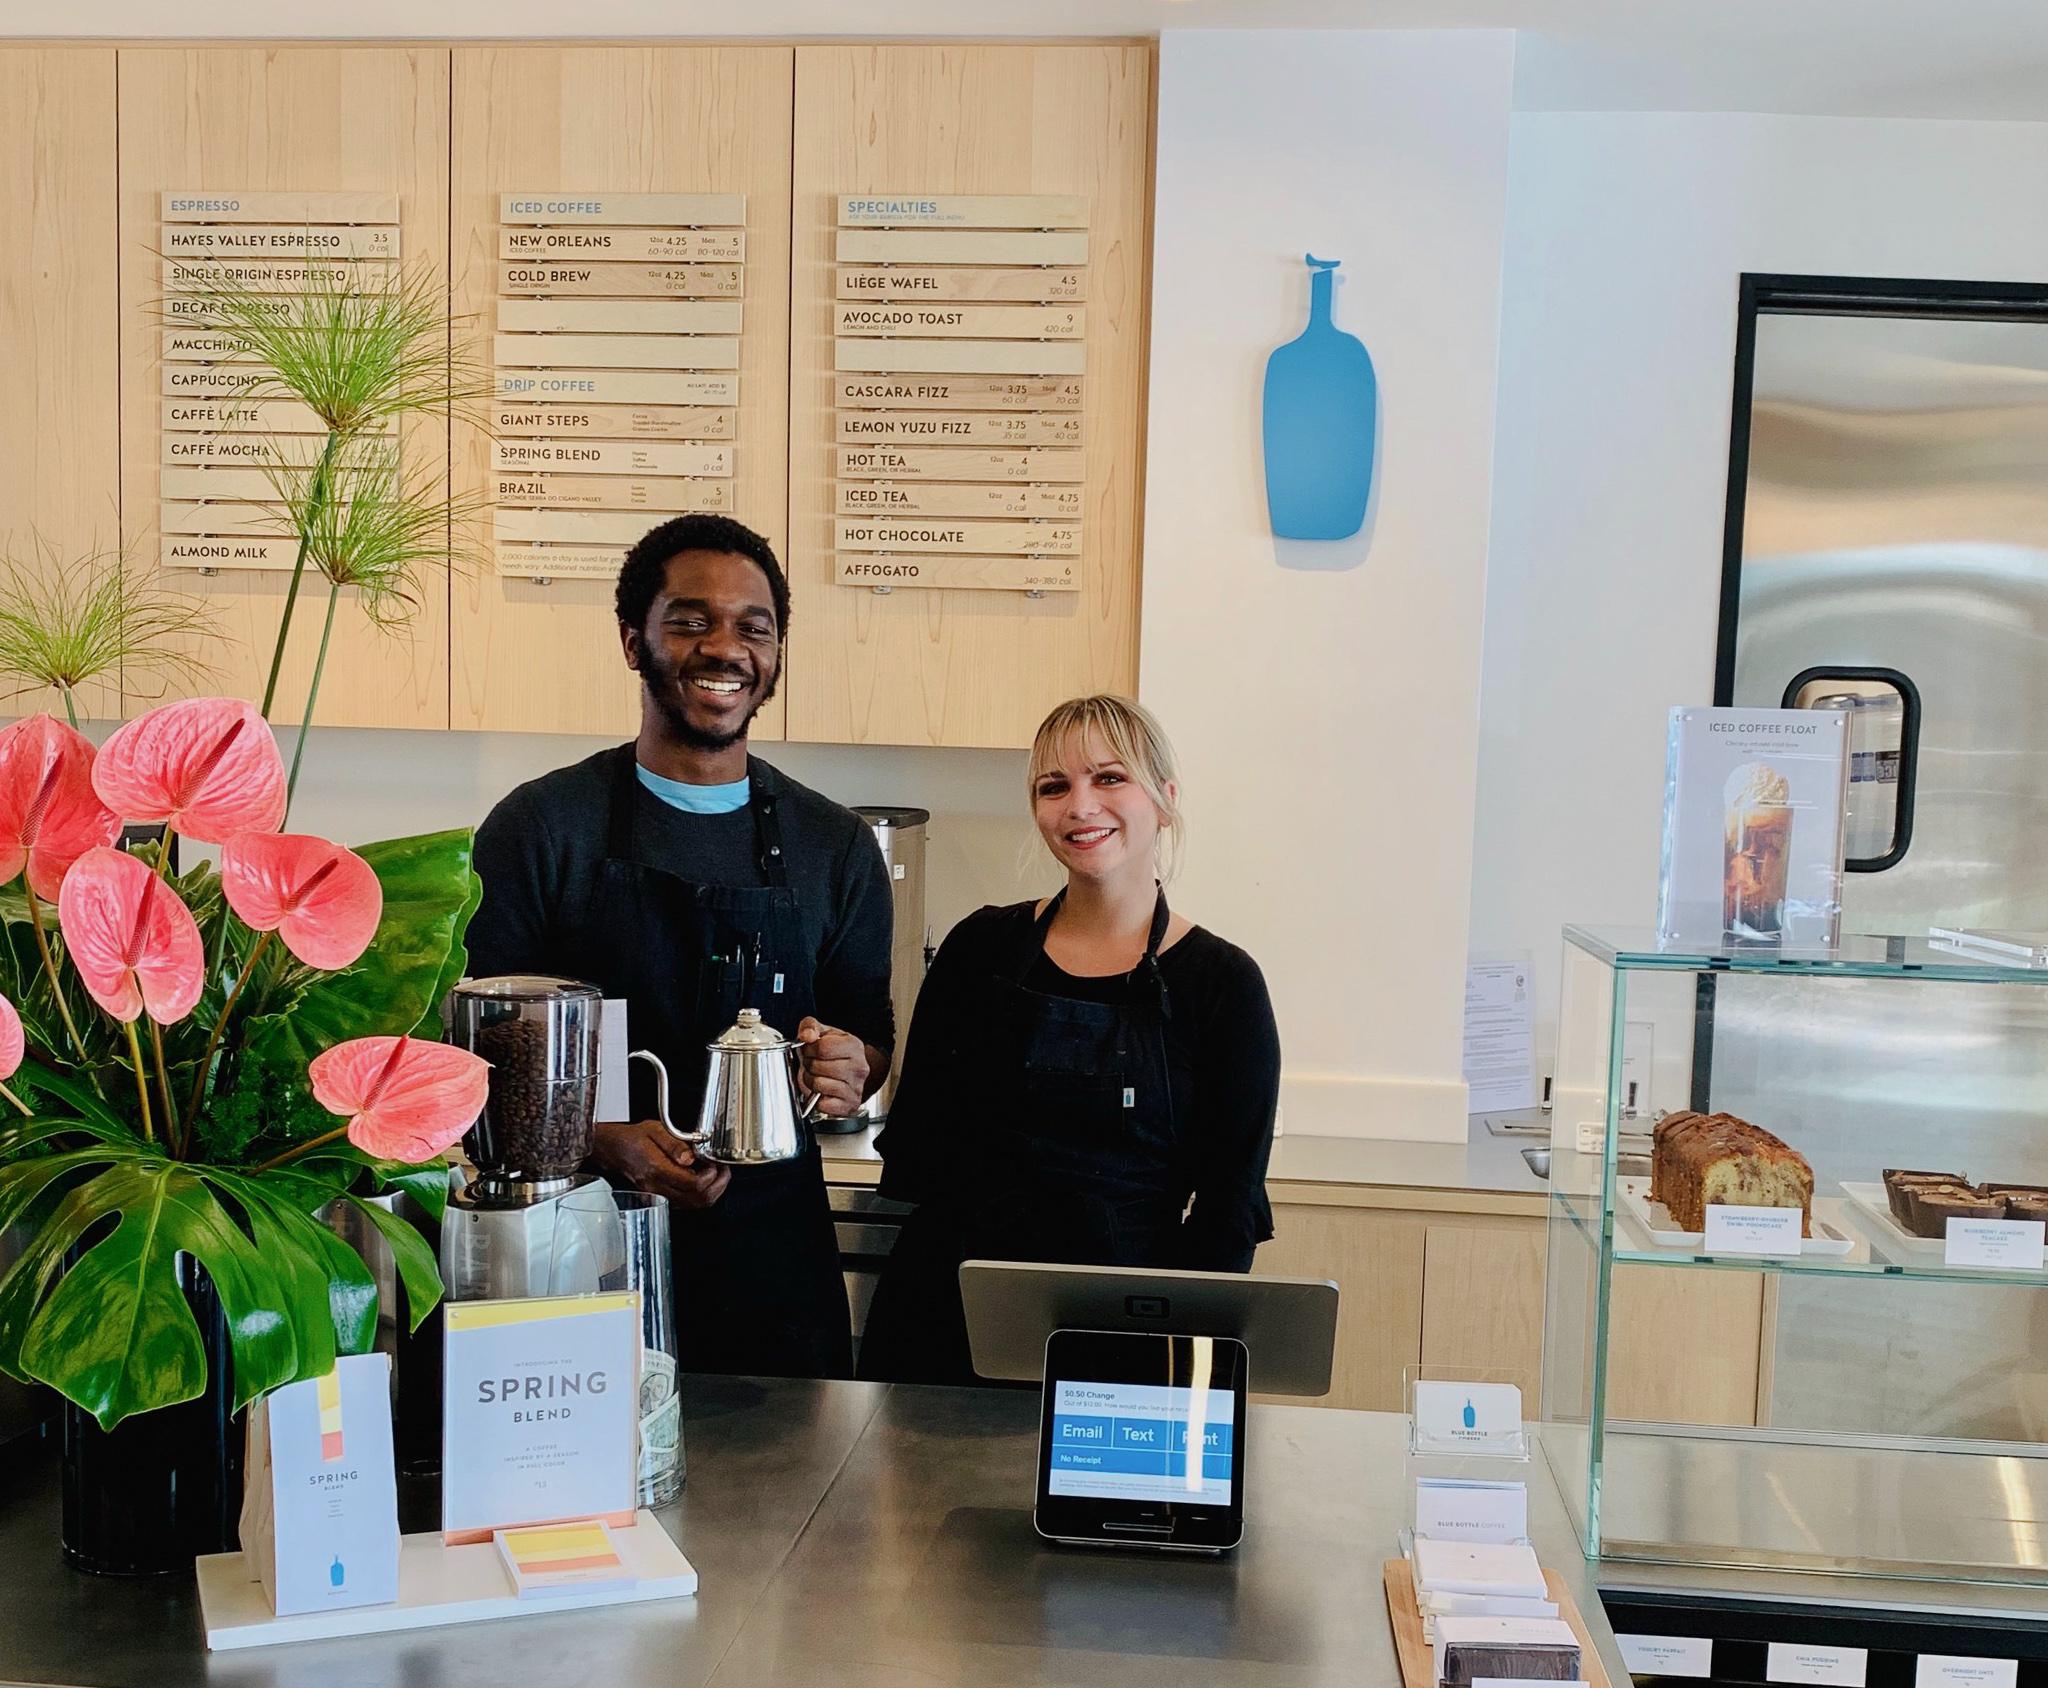 Blue Bottle Coffee counter in HanaHaus Newport Beach.